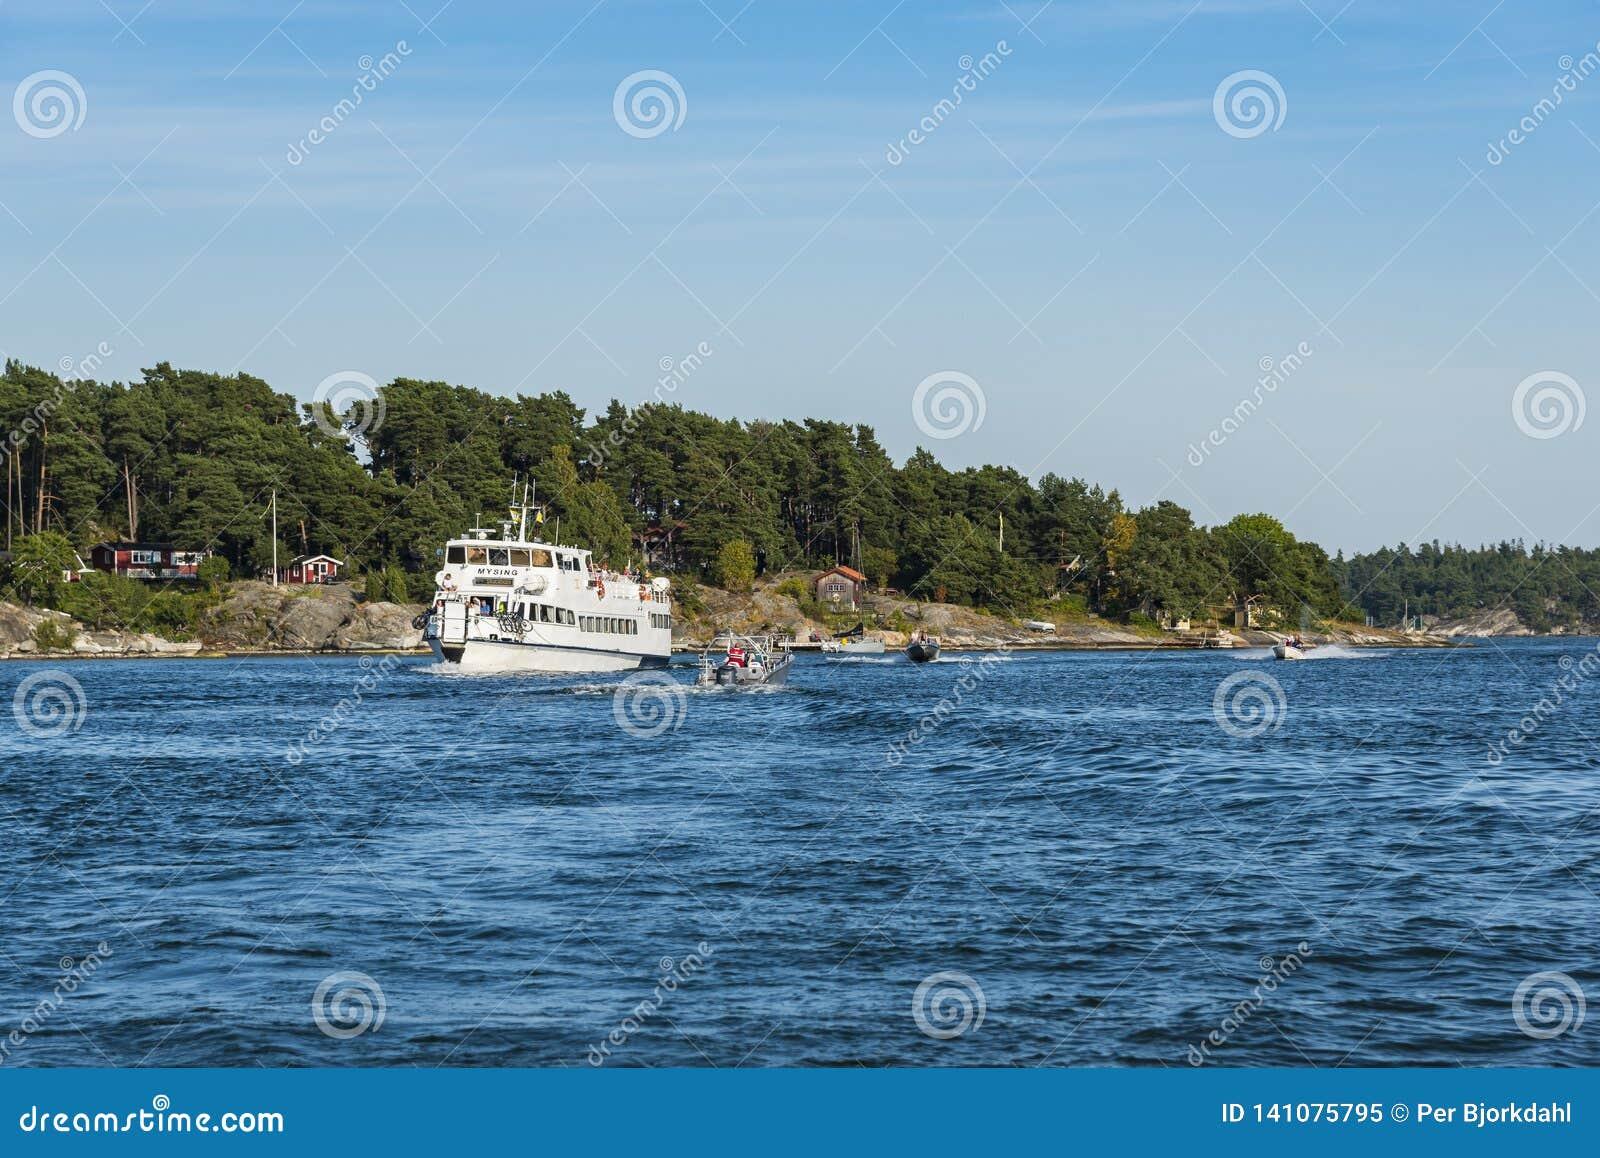 Arquipélago Dalarö de Éstocolmo do tráfego de mar